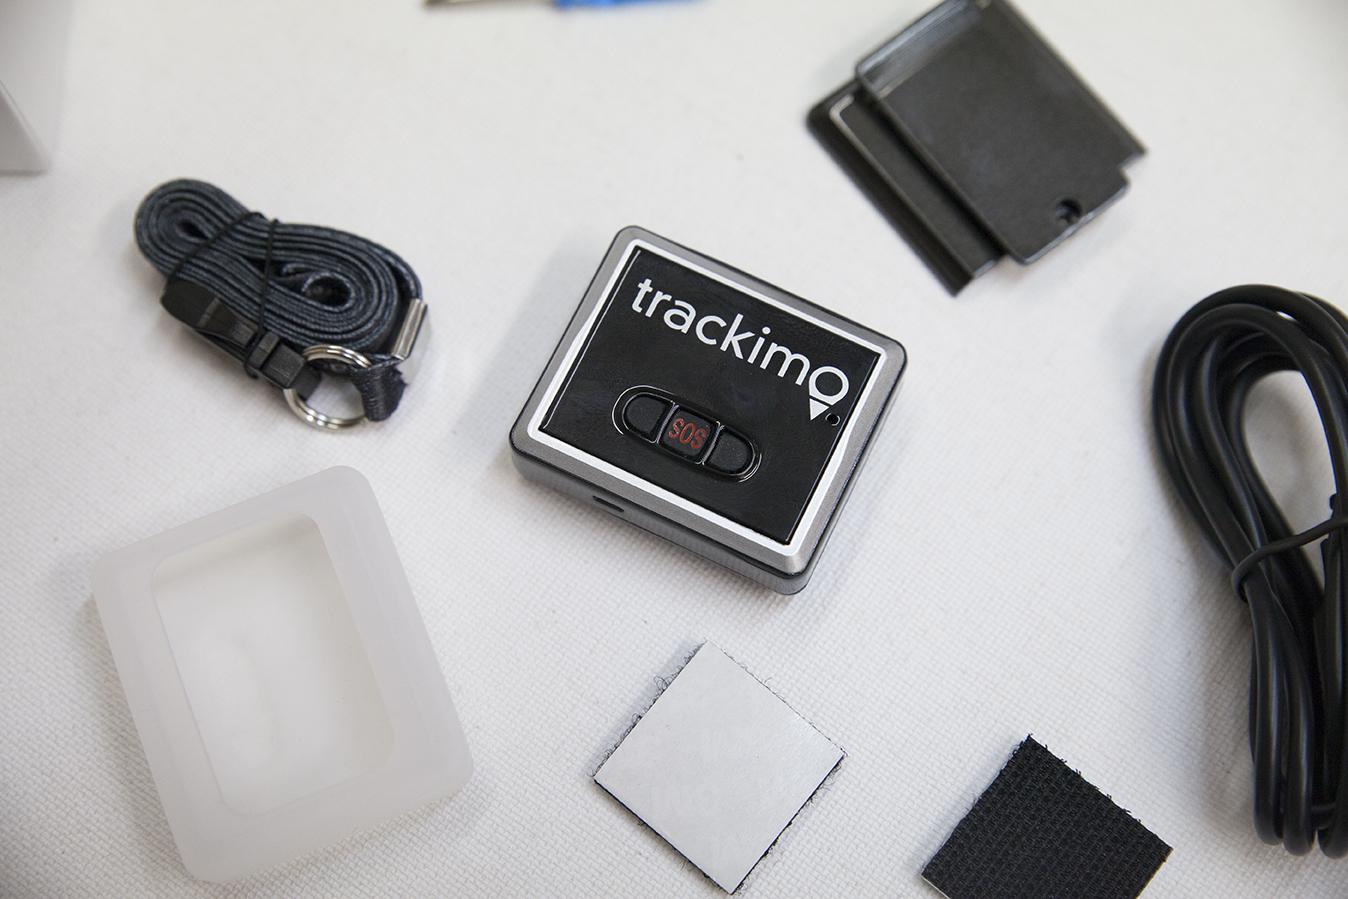 trackimo gps tracker hands on. Black Bedroom Furniture Sets. Home Design Ideas